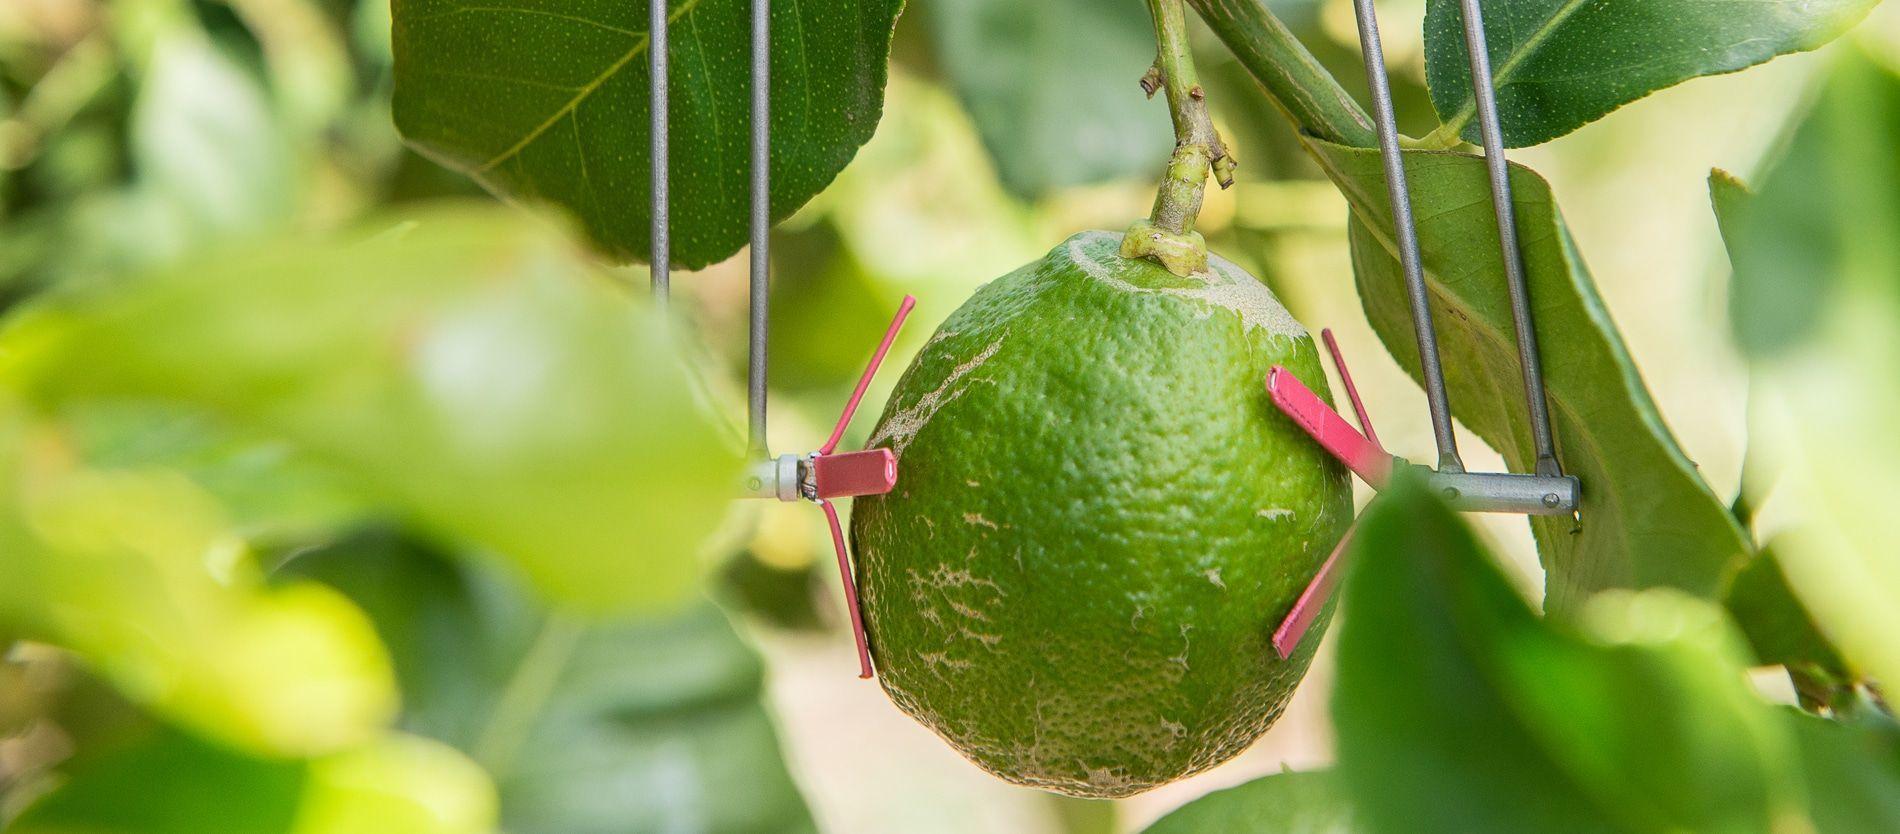 SupPlant raises $10 million for affordable irrigation for smallholder farmers - Impact Alpha